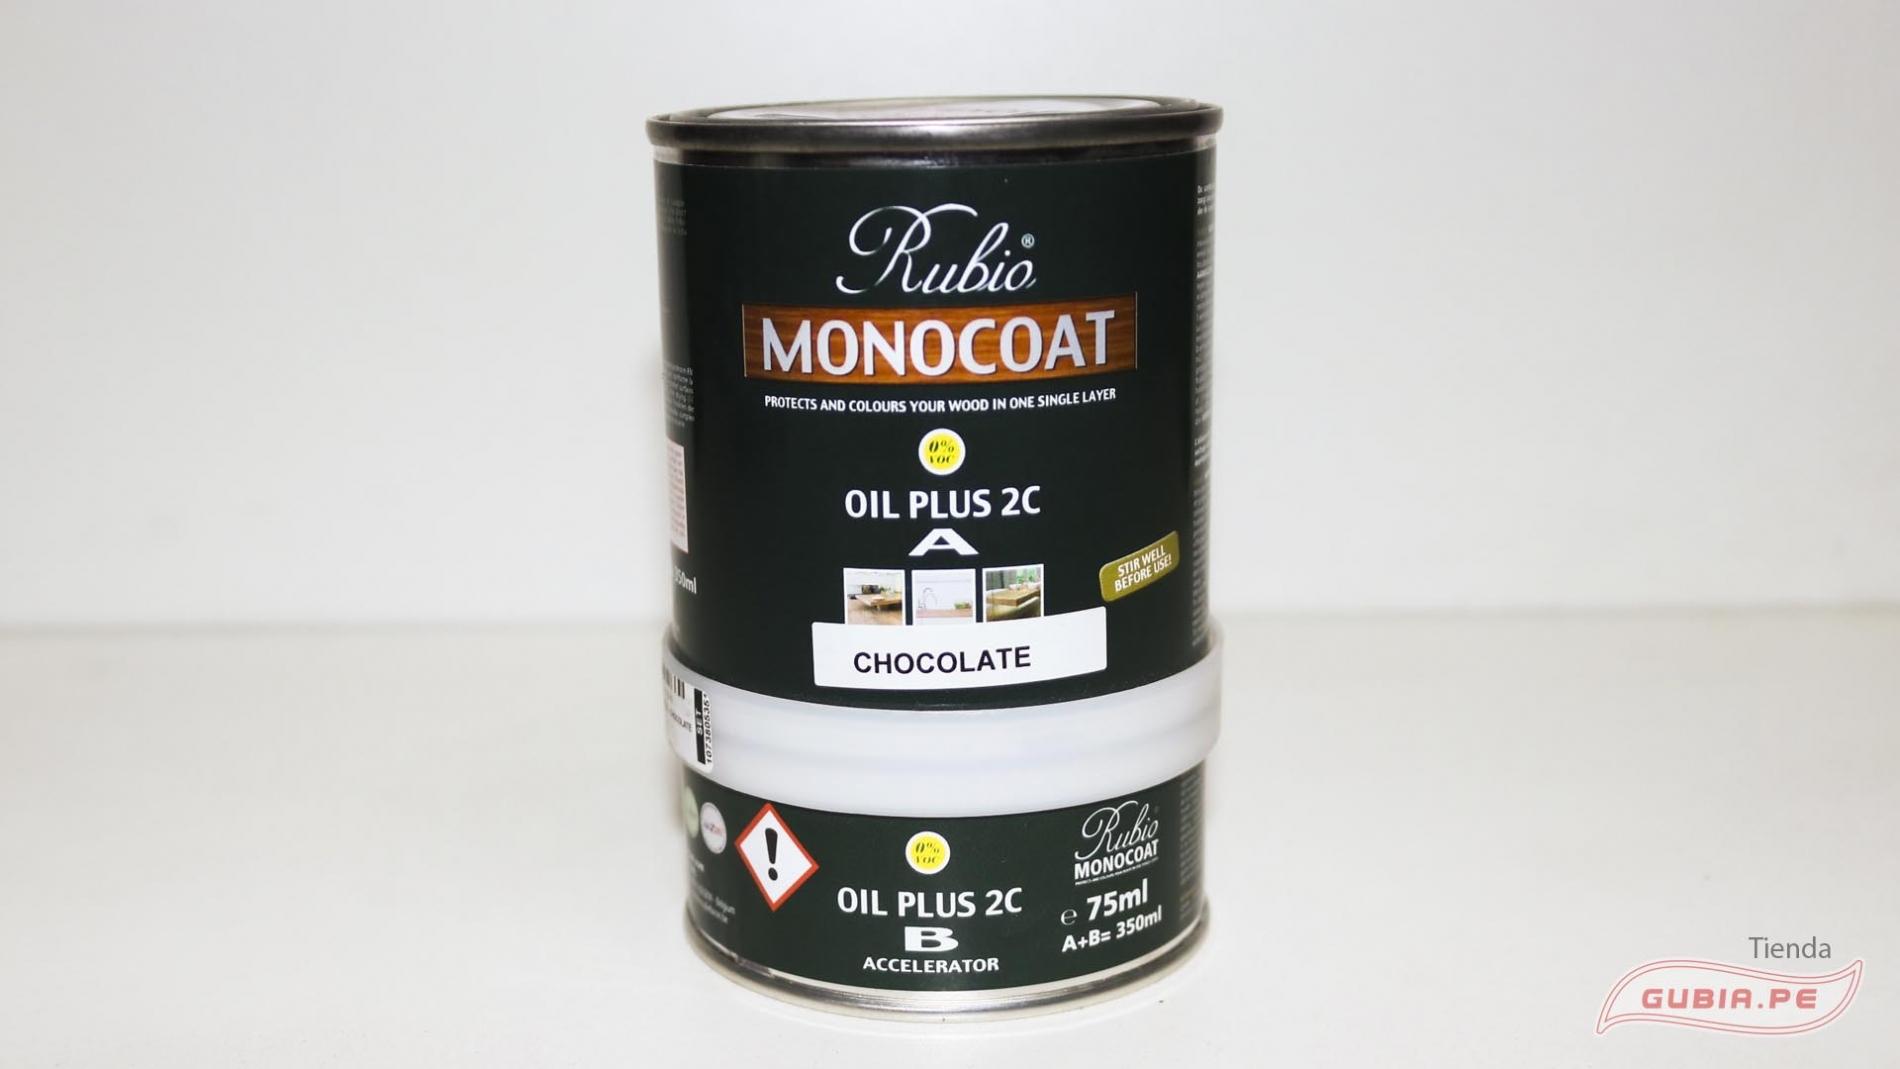 541076231434-Chocolate Set A+B Oil Plus 2C (350ml) RMC-max-1.